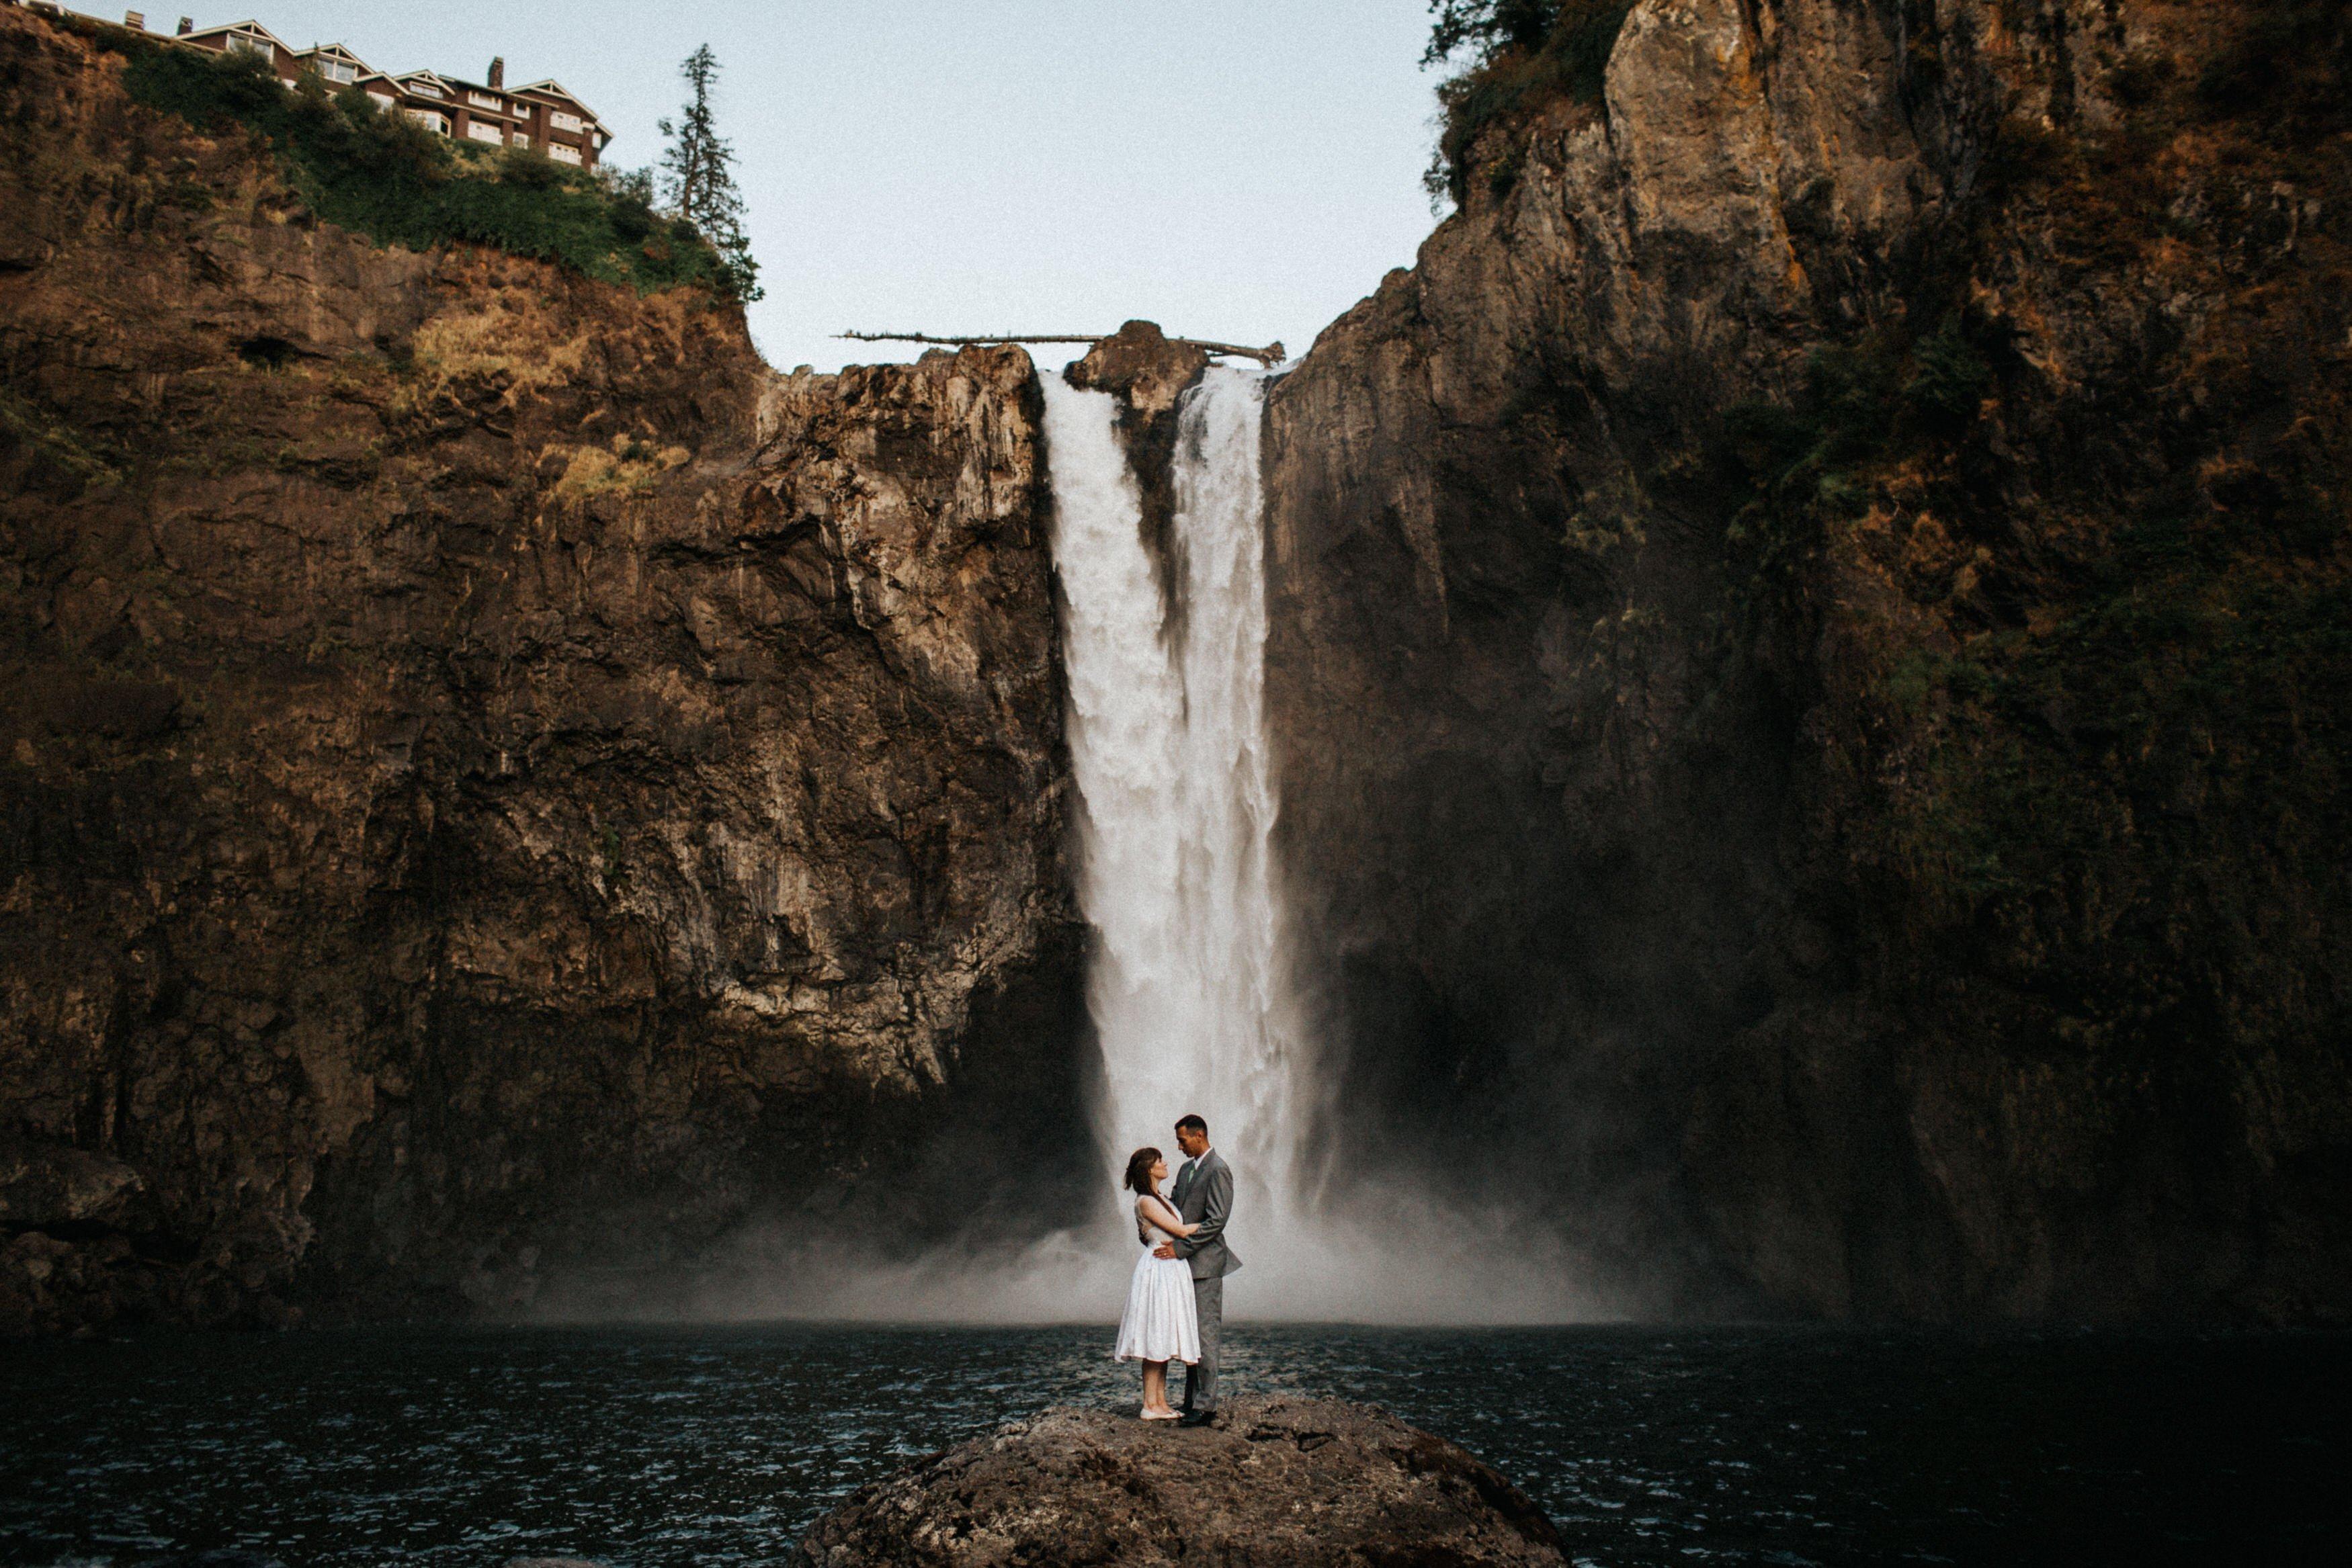 Wiley Putnam Seattle Wedding Photographer Snoqualmie Falls 1